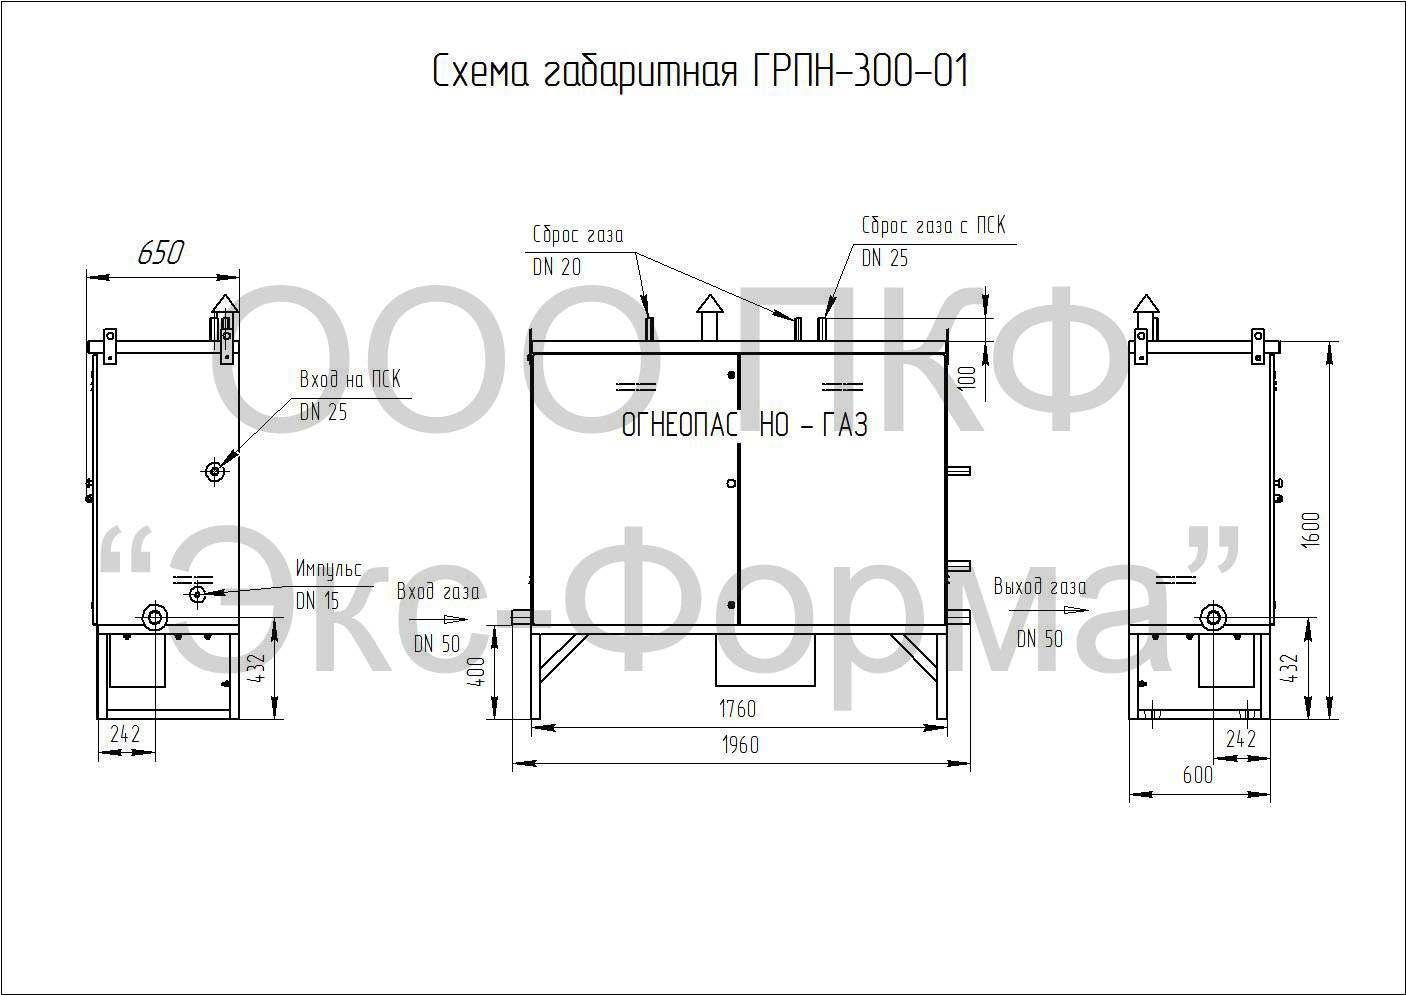 схема ГРПН-300-10-03